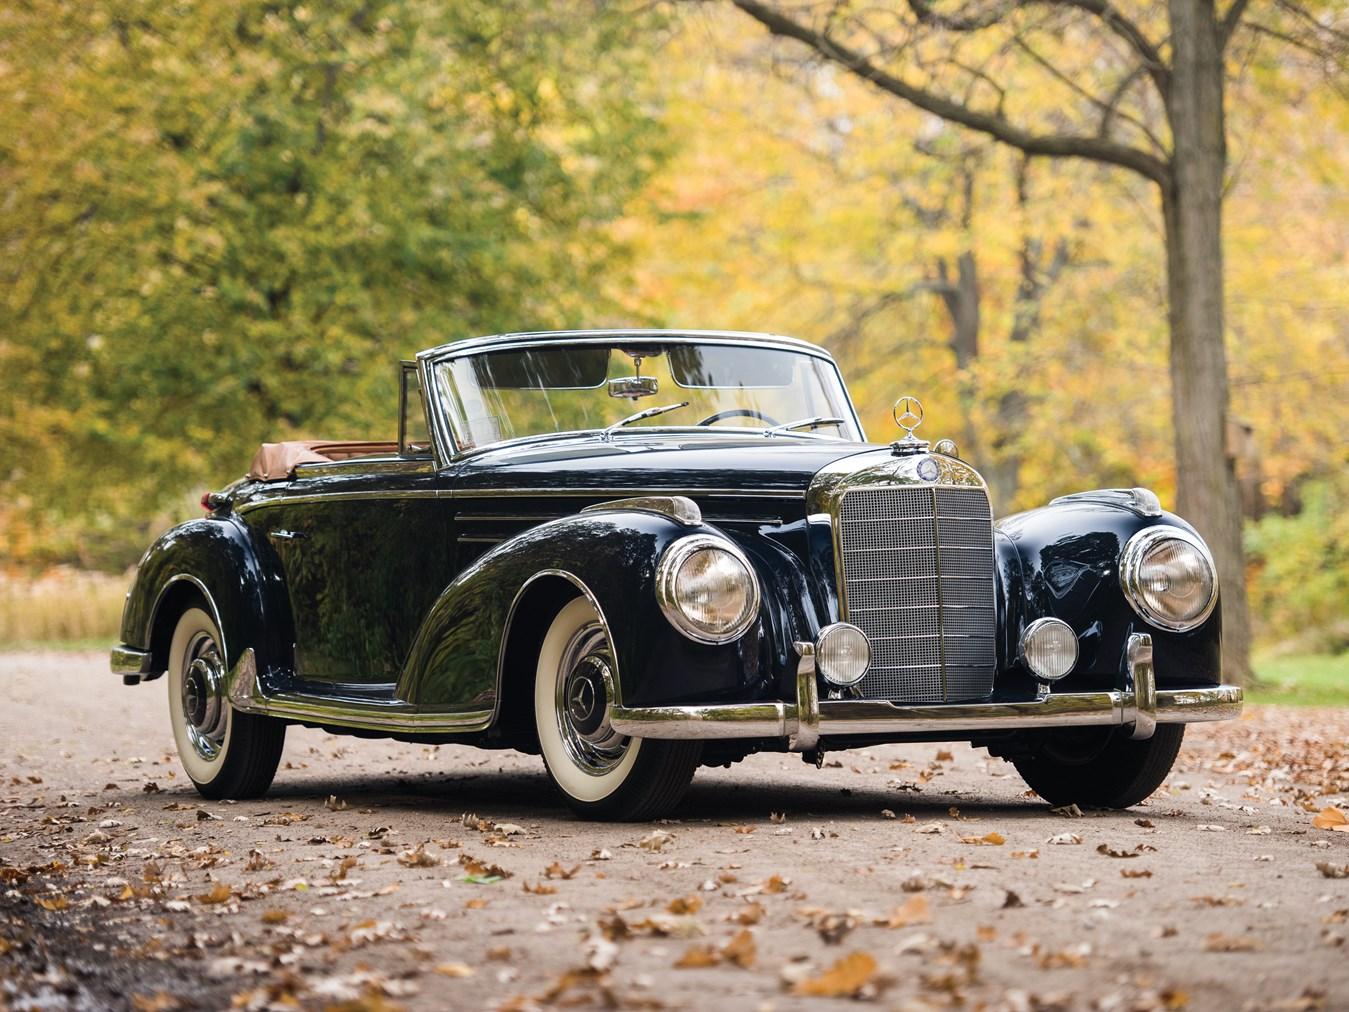 Rm sotheby 39 s r131 1956 mercedes benz 300 sc roadster for Mercedes benz greenville sc